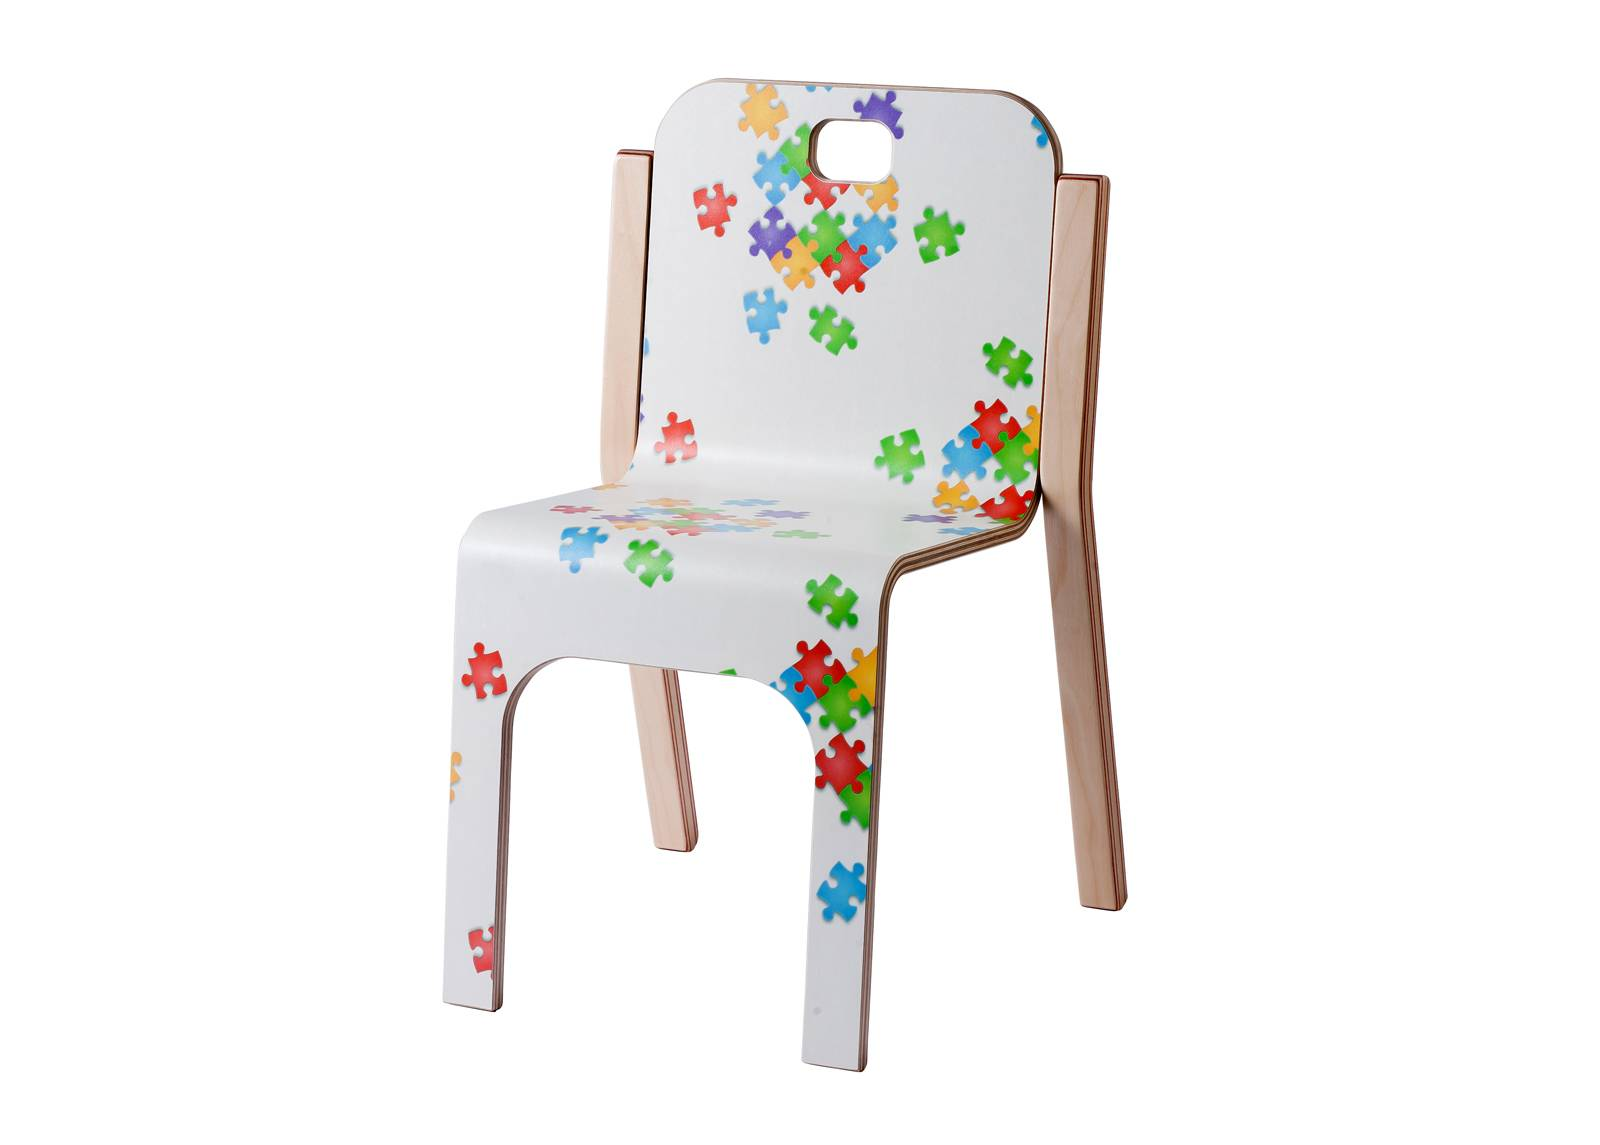 TARMEKO KIDS Lasten tuoli TOMMY 2 PUZZLE h 57/31 cm